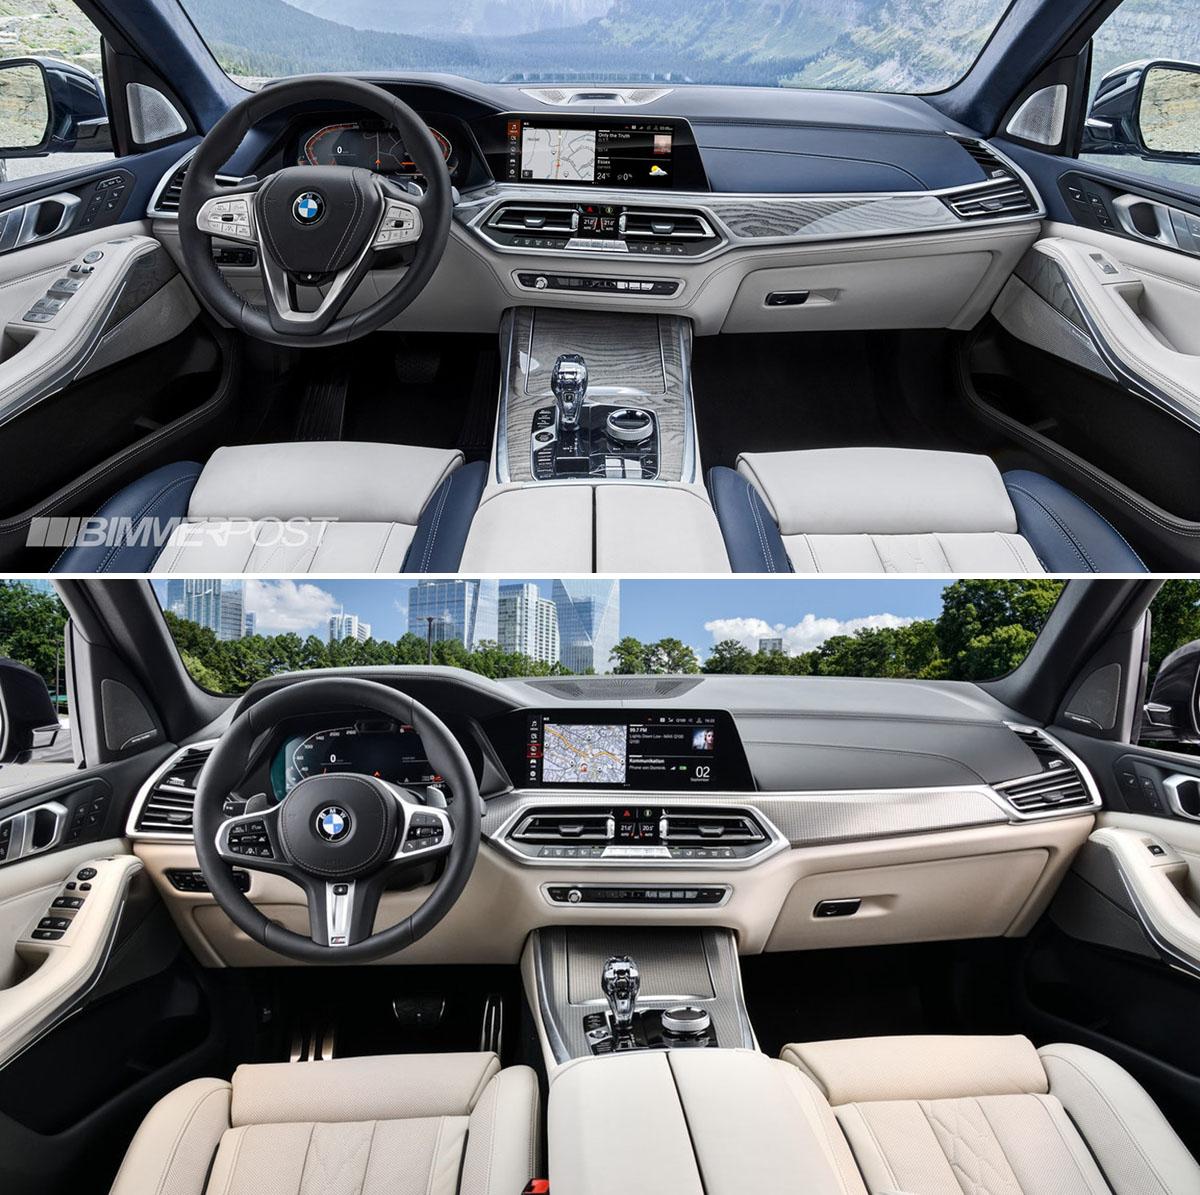 Bmw X7 2018: Visual Comparison: 2019 BMW X7 Vs BMW X5